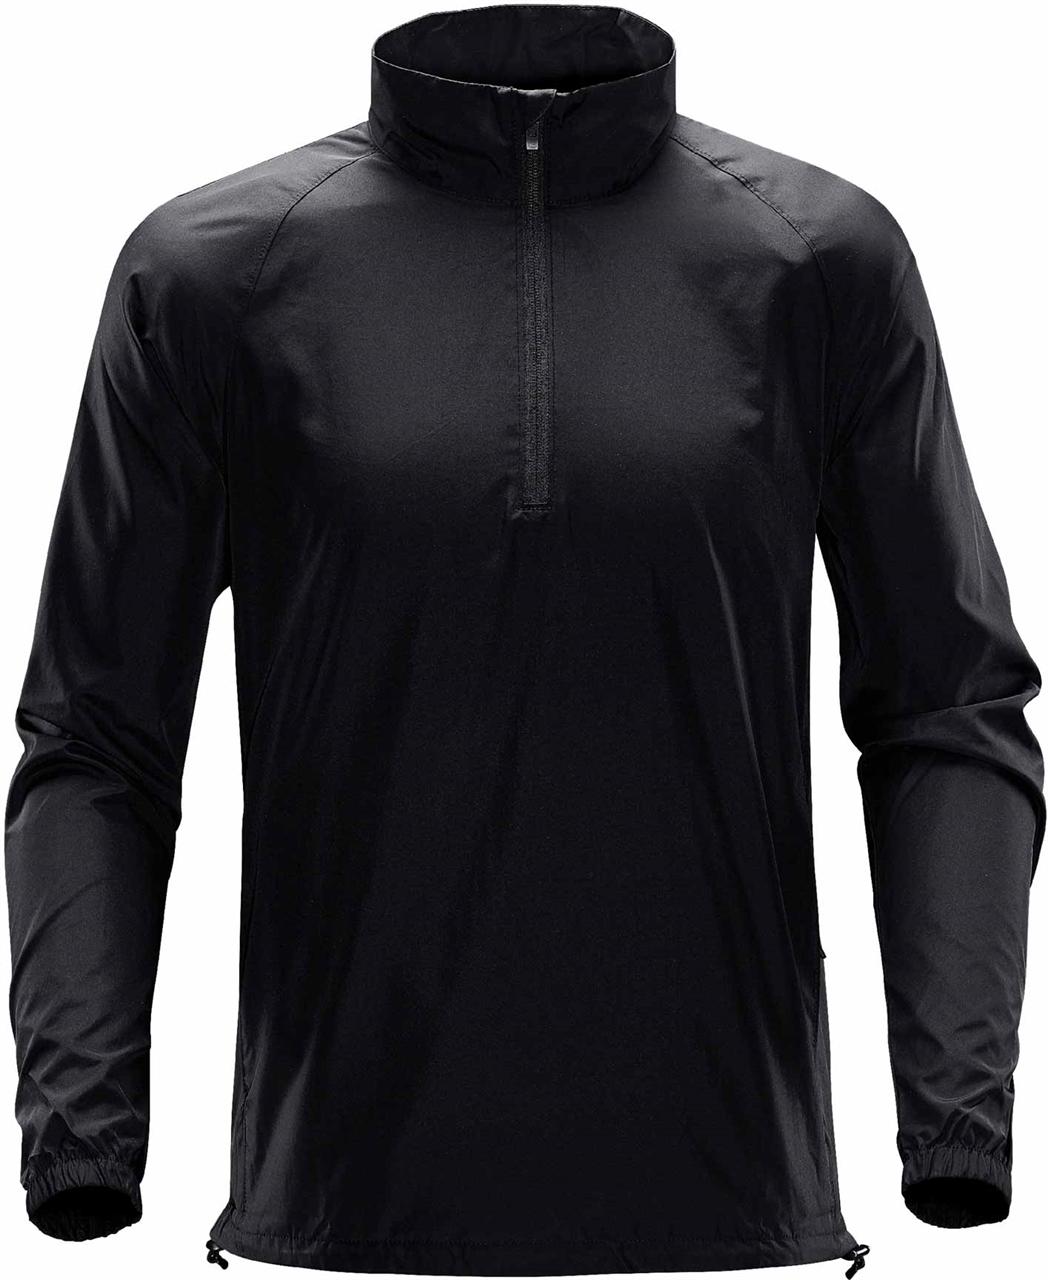 Picture of STORMTECH Men's Micro Light II Windshirt